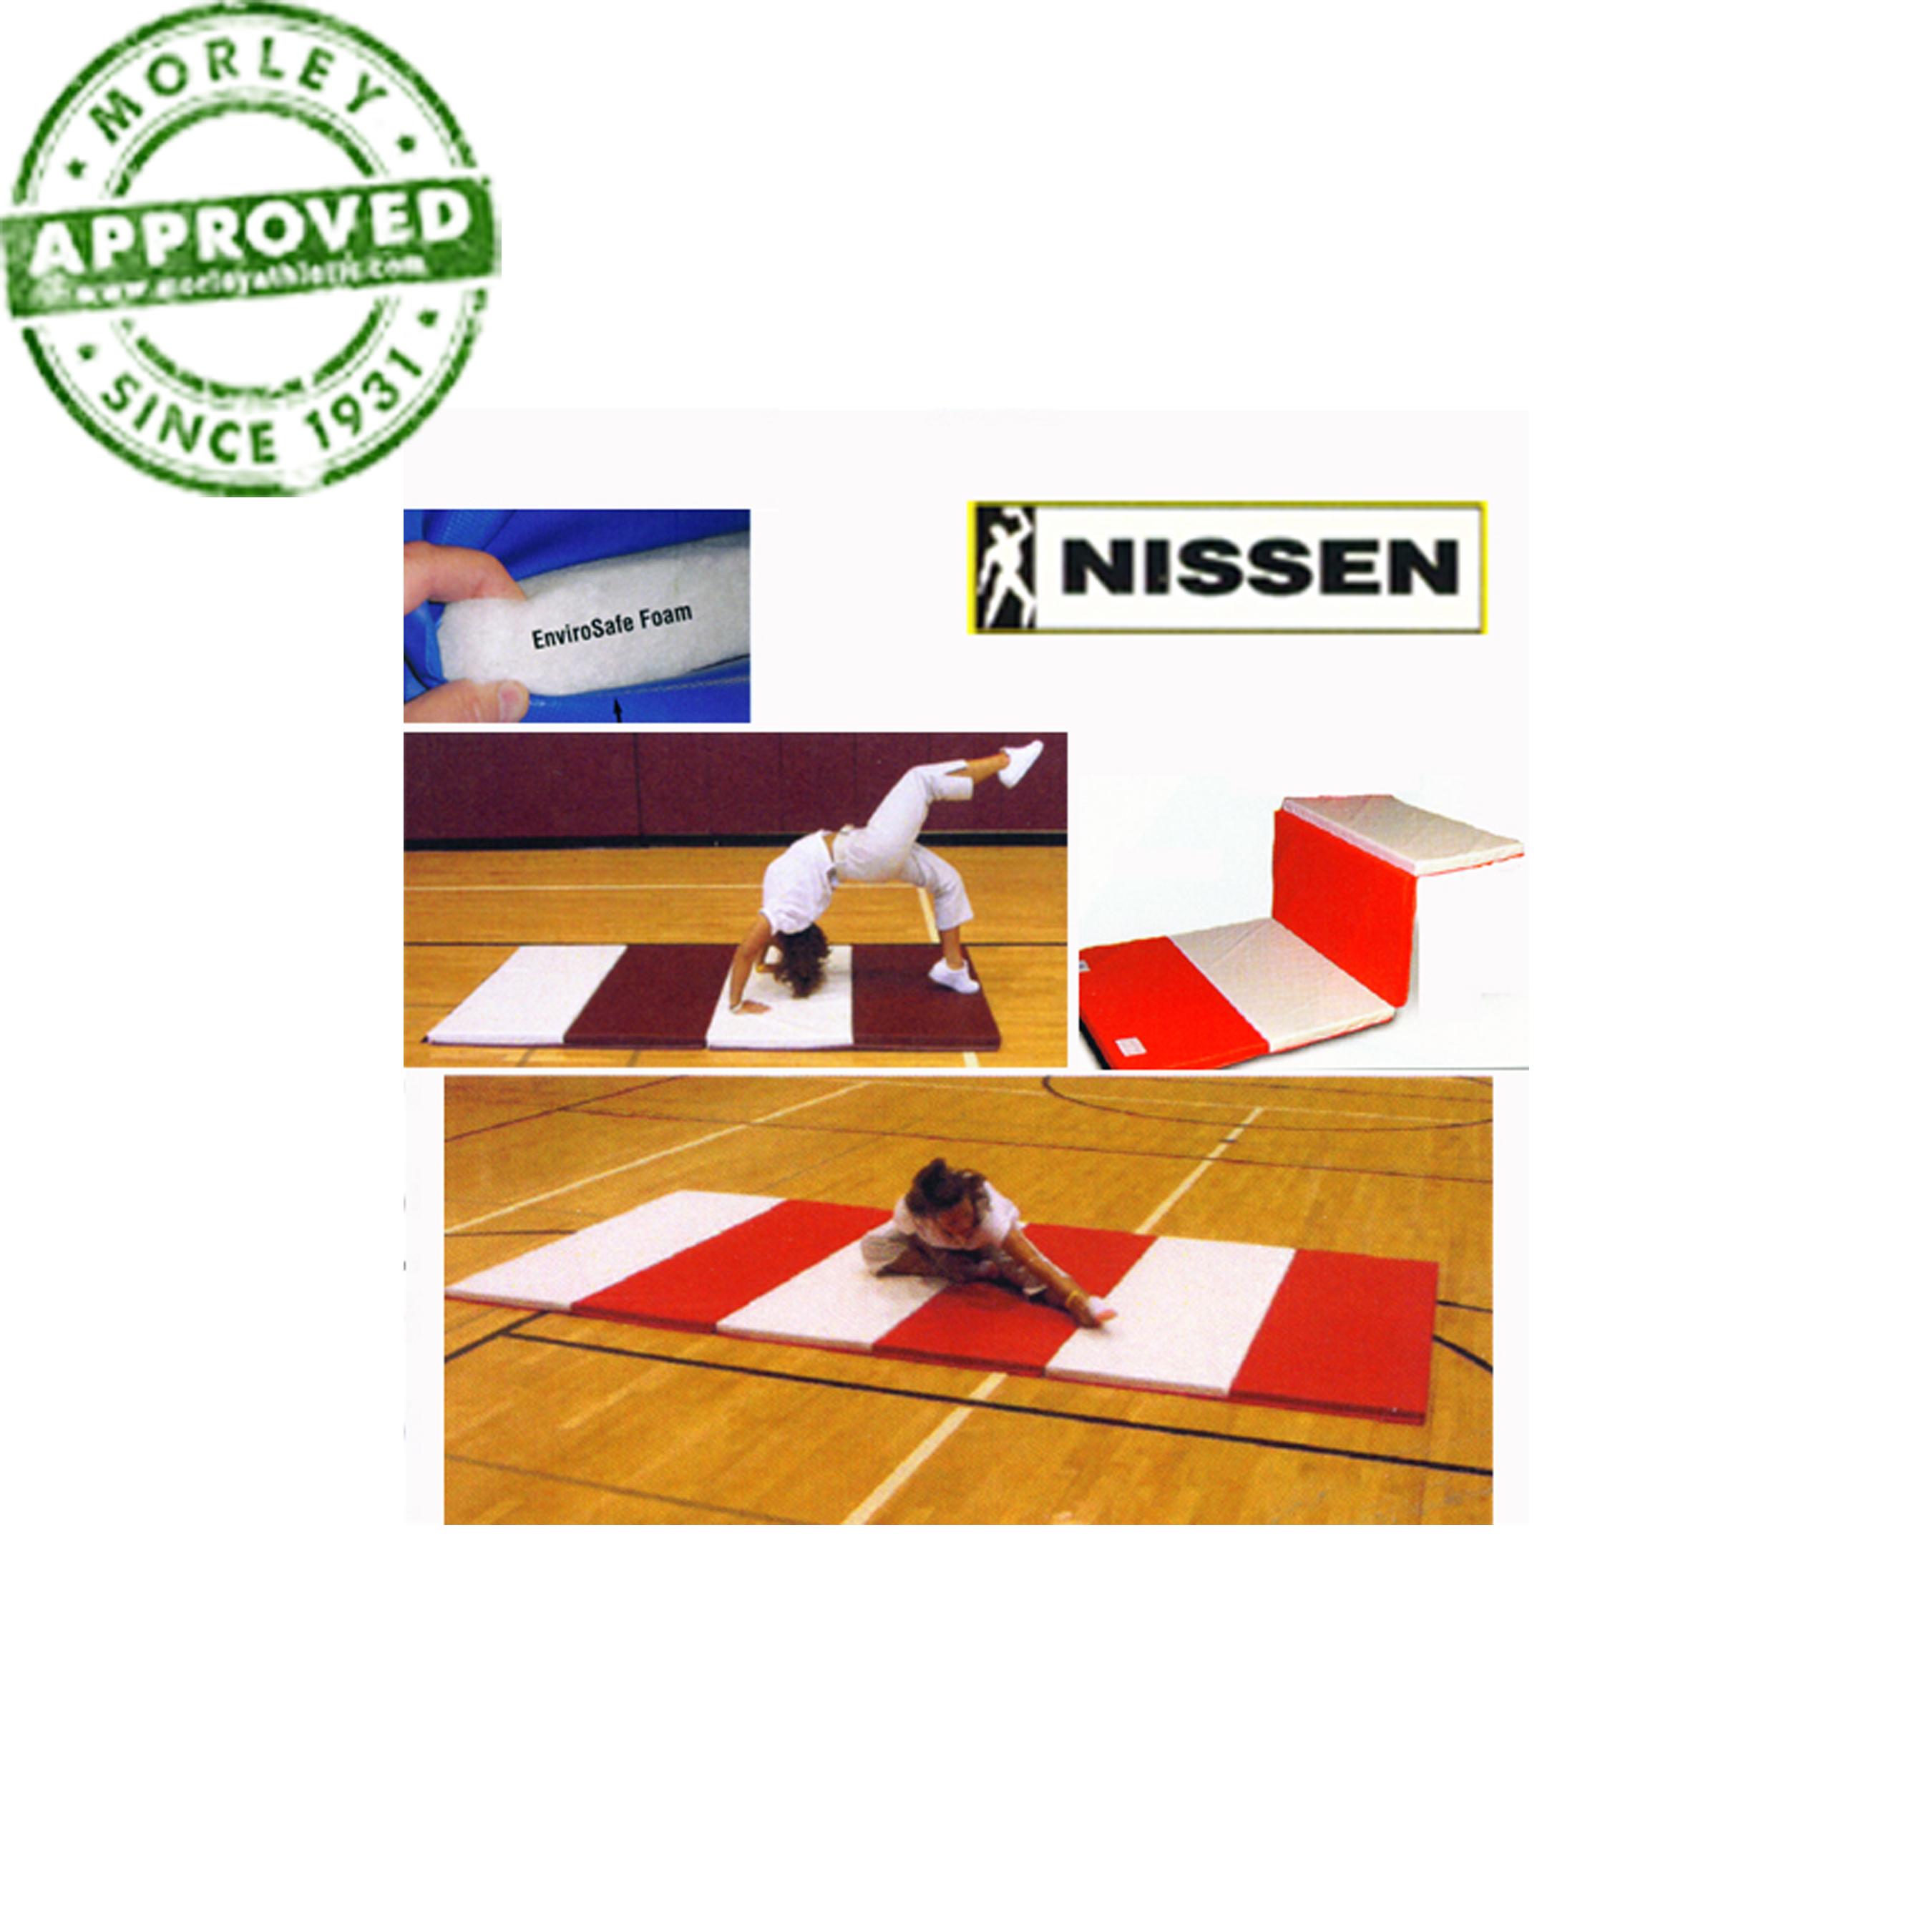 "Nissen Envirosafe Flex Firm Folding Tumbling Mat 2"" Thick With Velcro On Ends - 2' Folds"